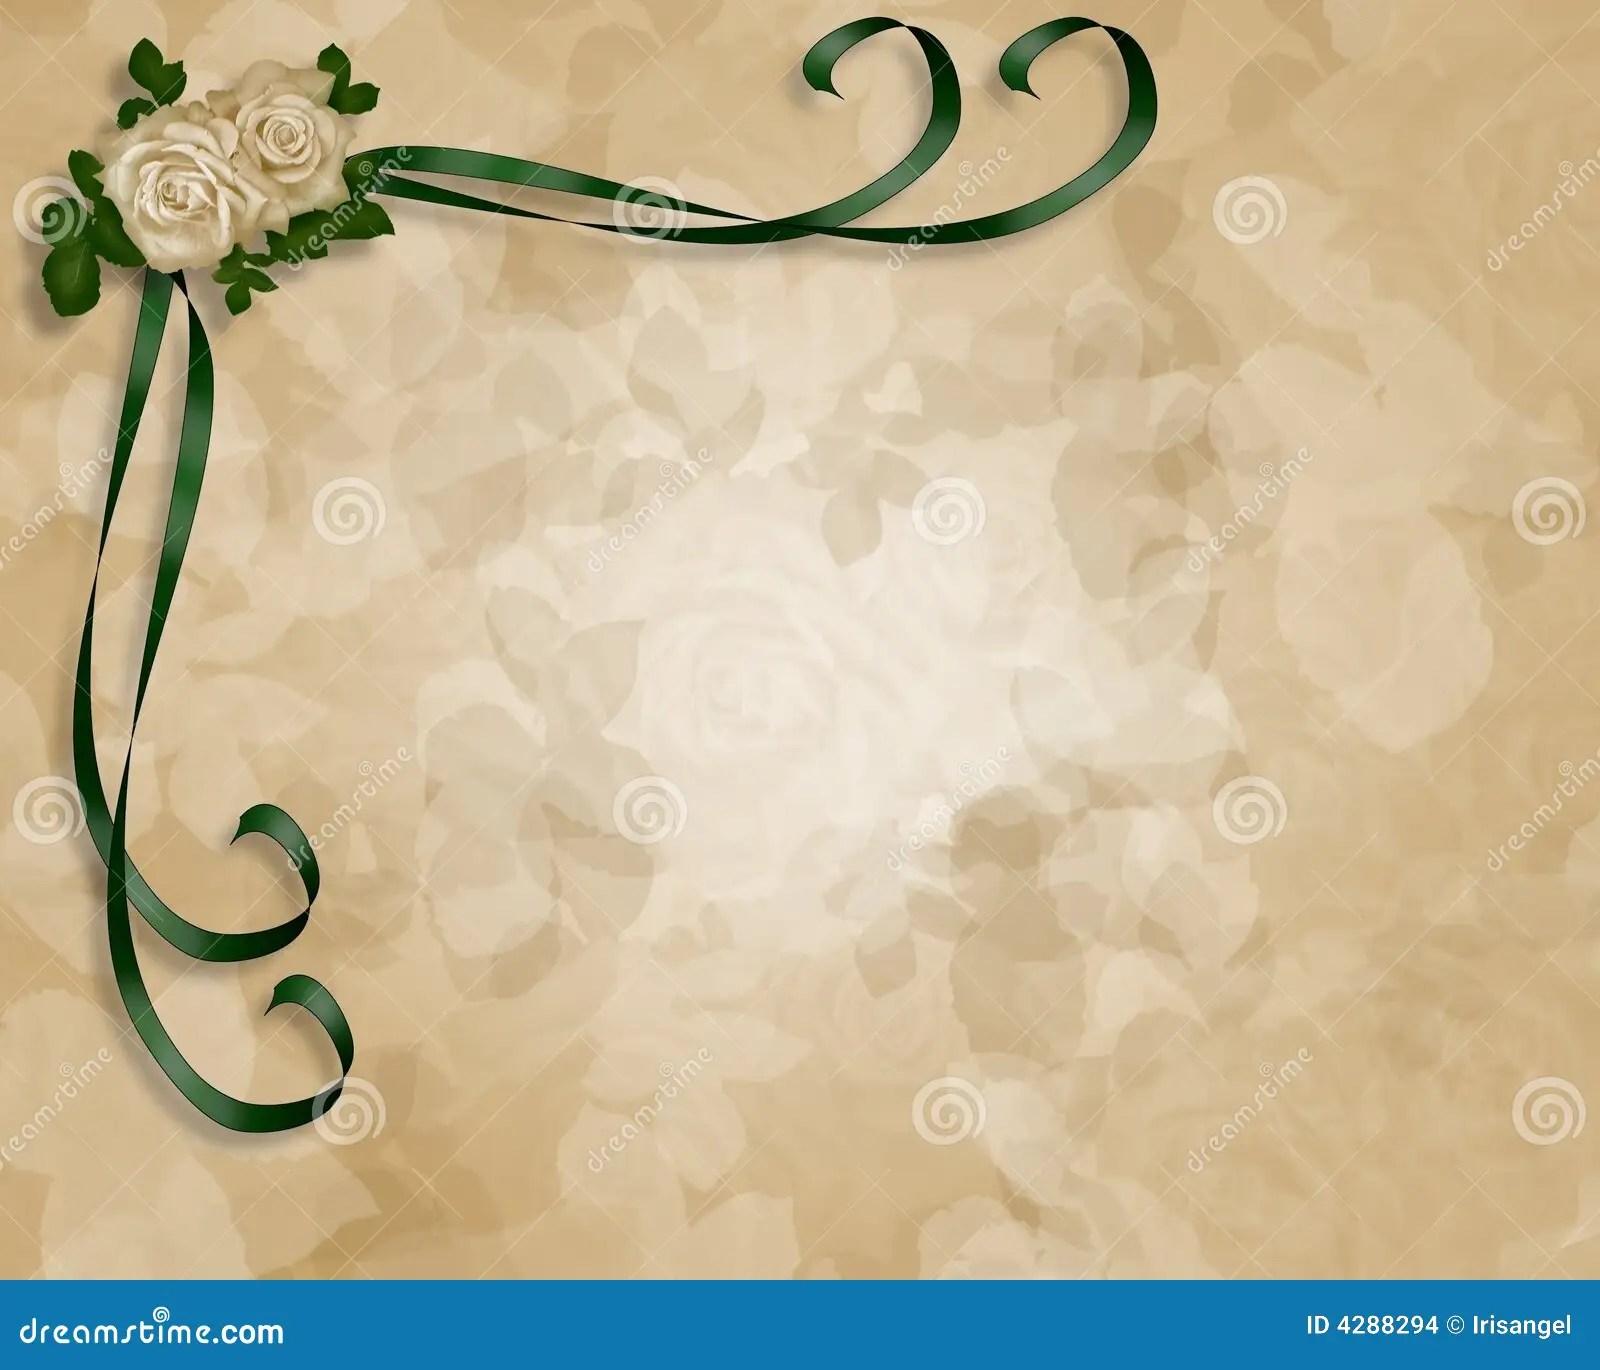 Personal Wedding Invitation Designs